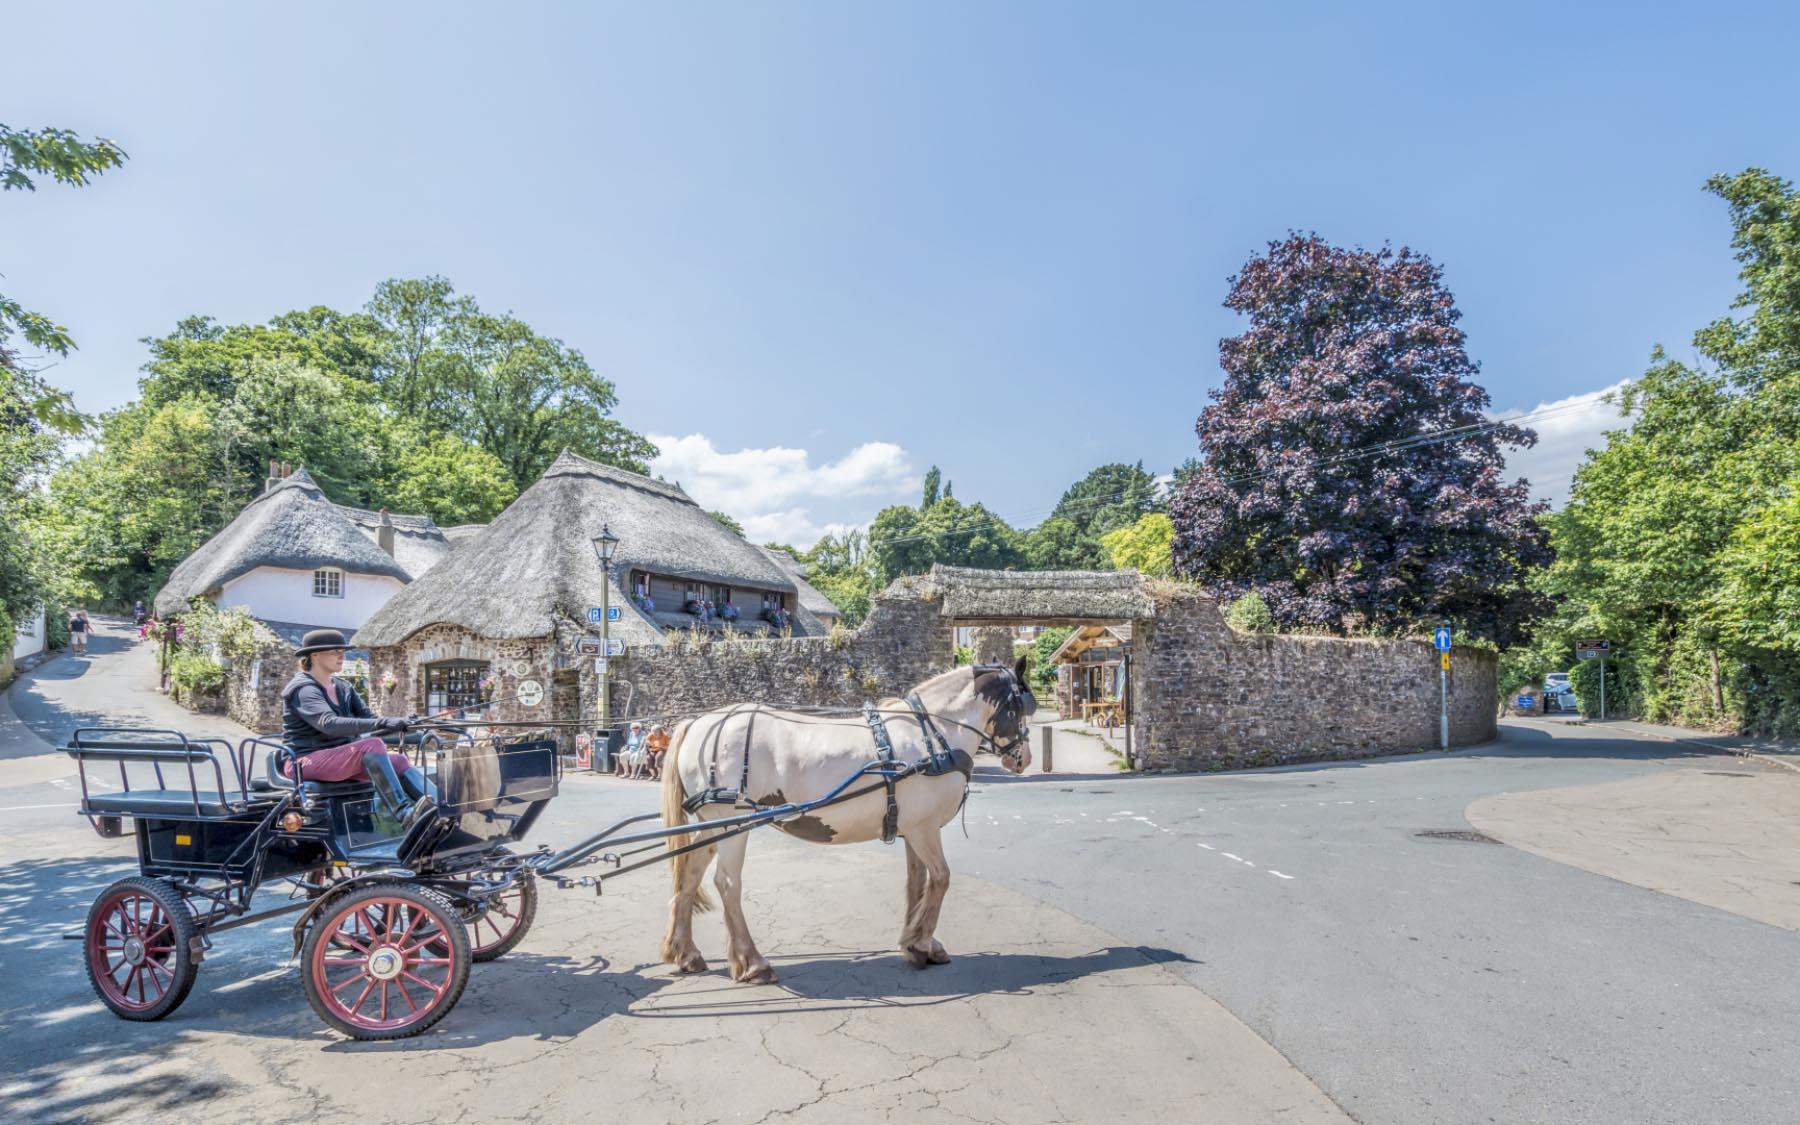 Cockington horse and carriage